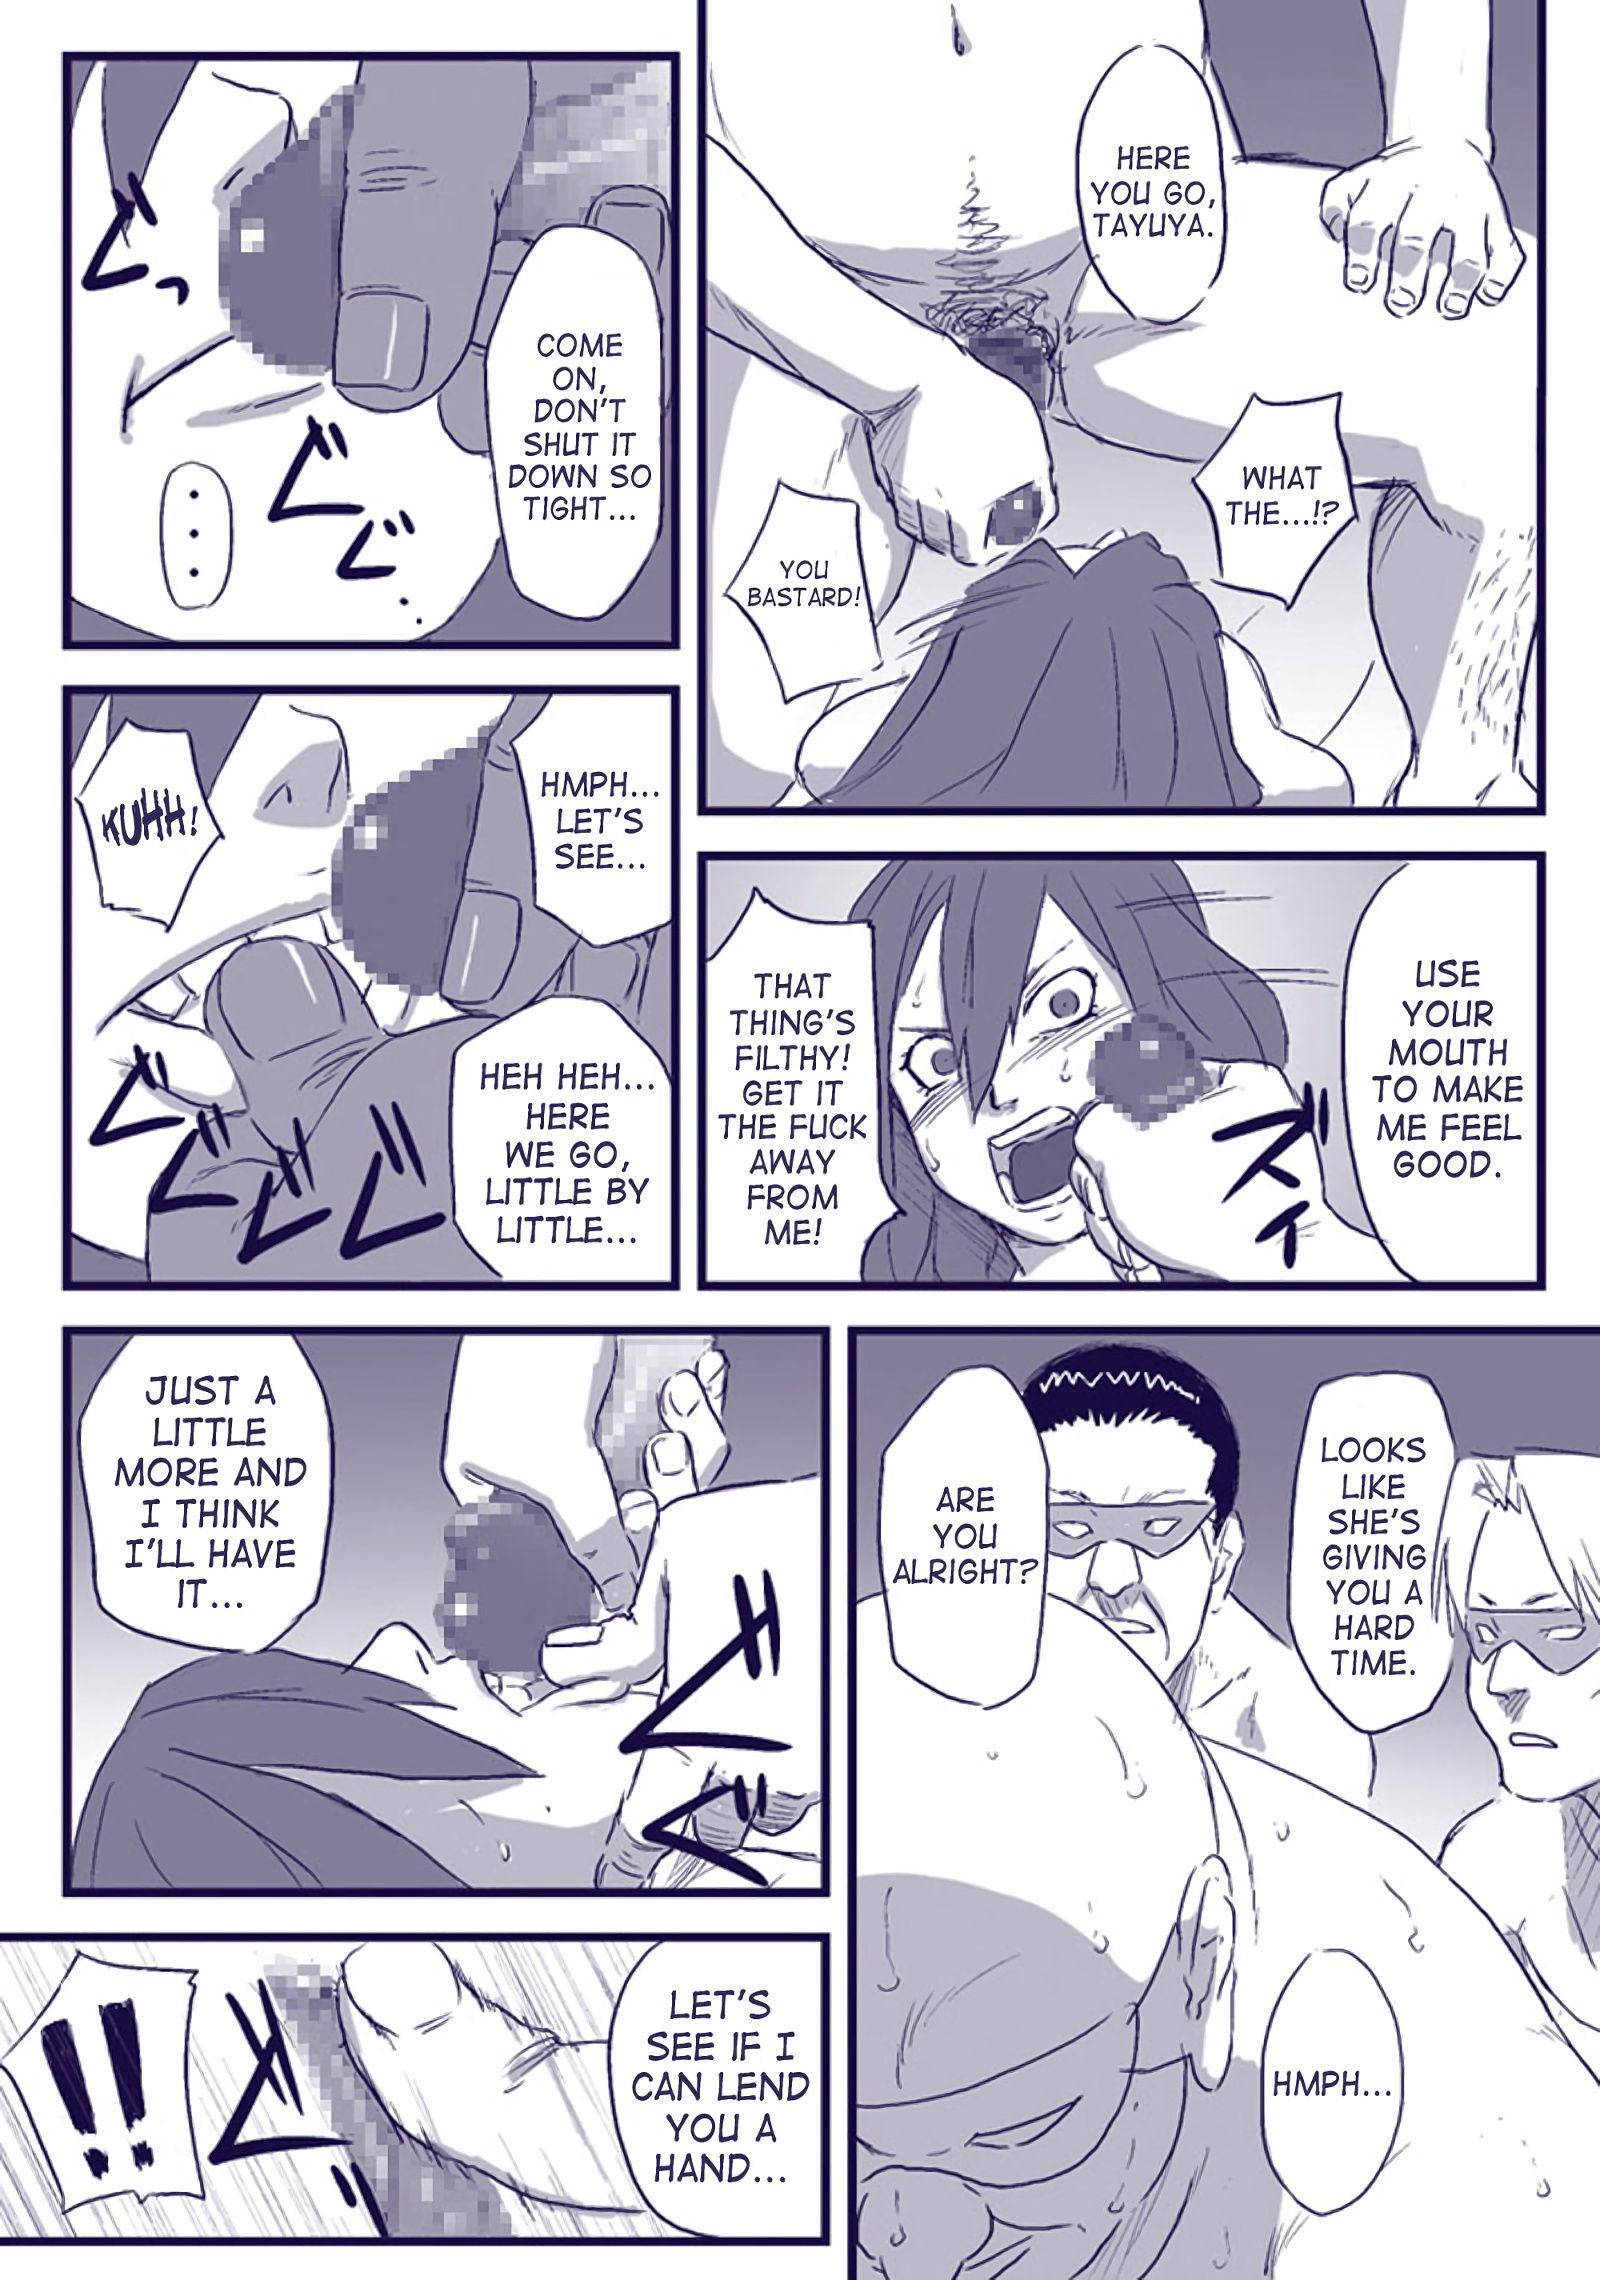 Ninja dependence vol. 2 hentai manga picture 14